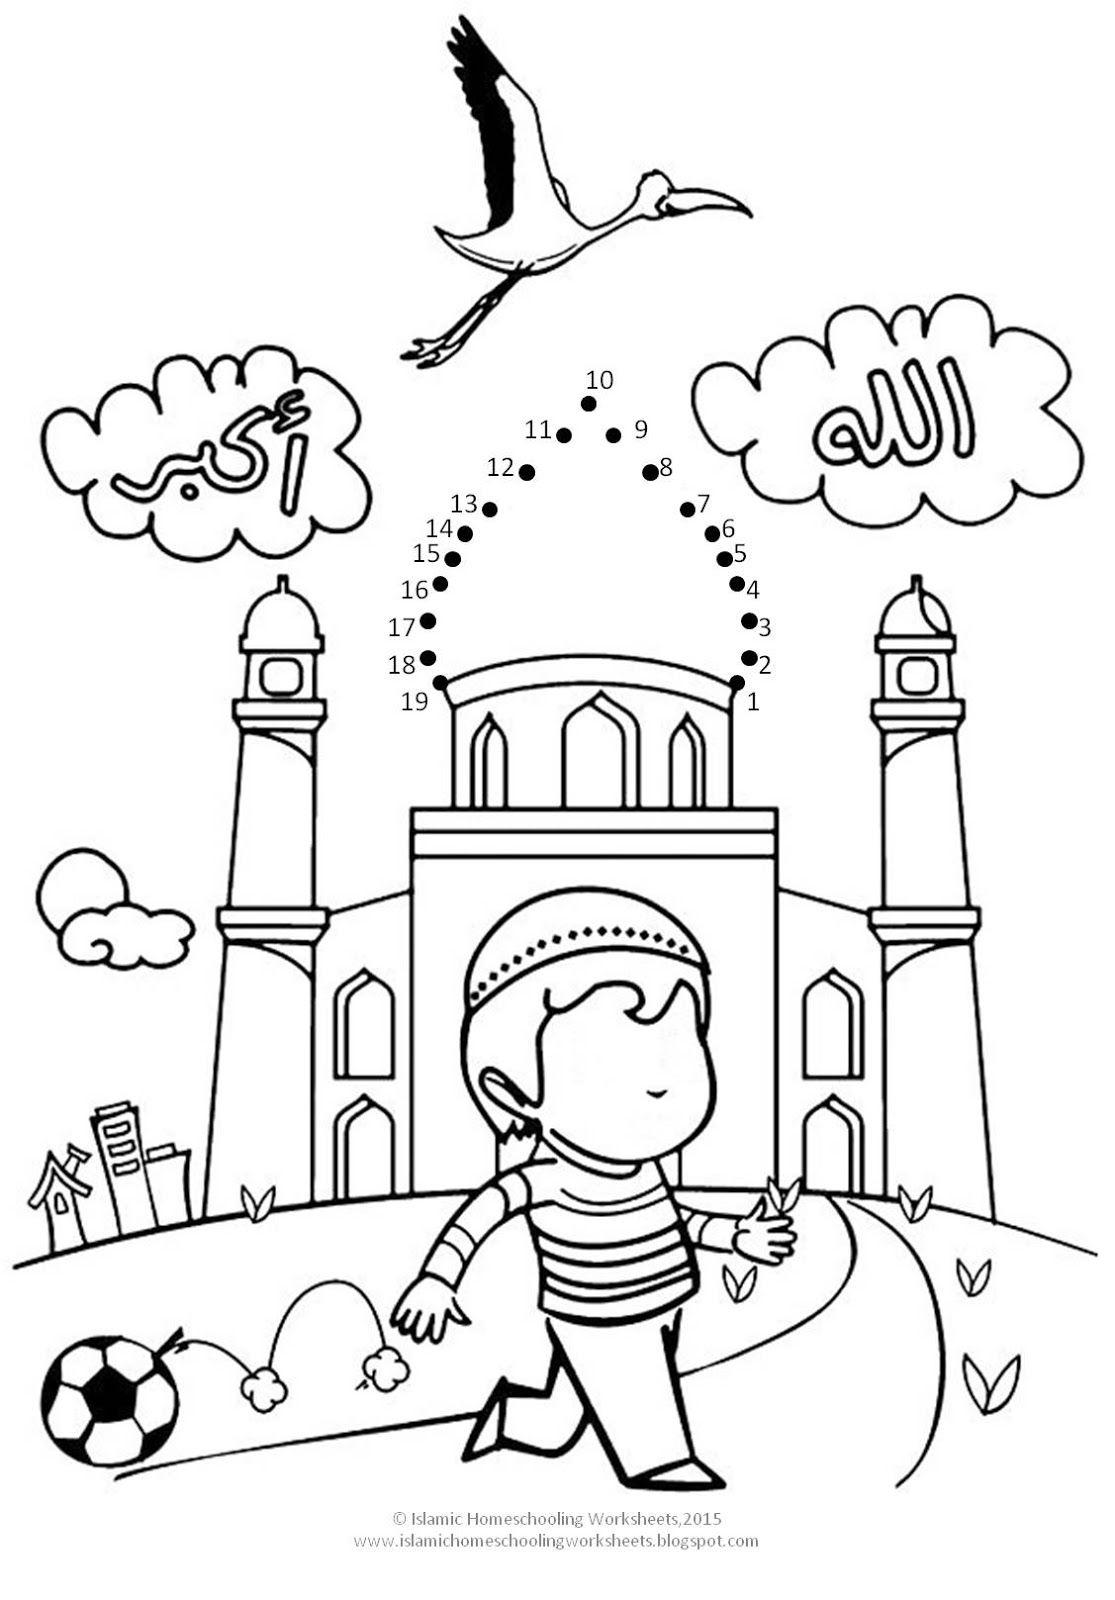 islamic homeschooling  buku mewarnai seni islamis